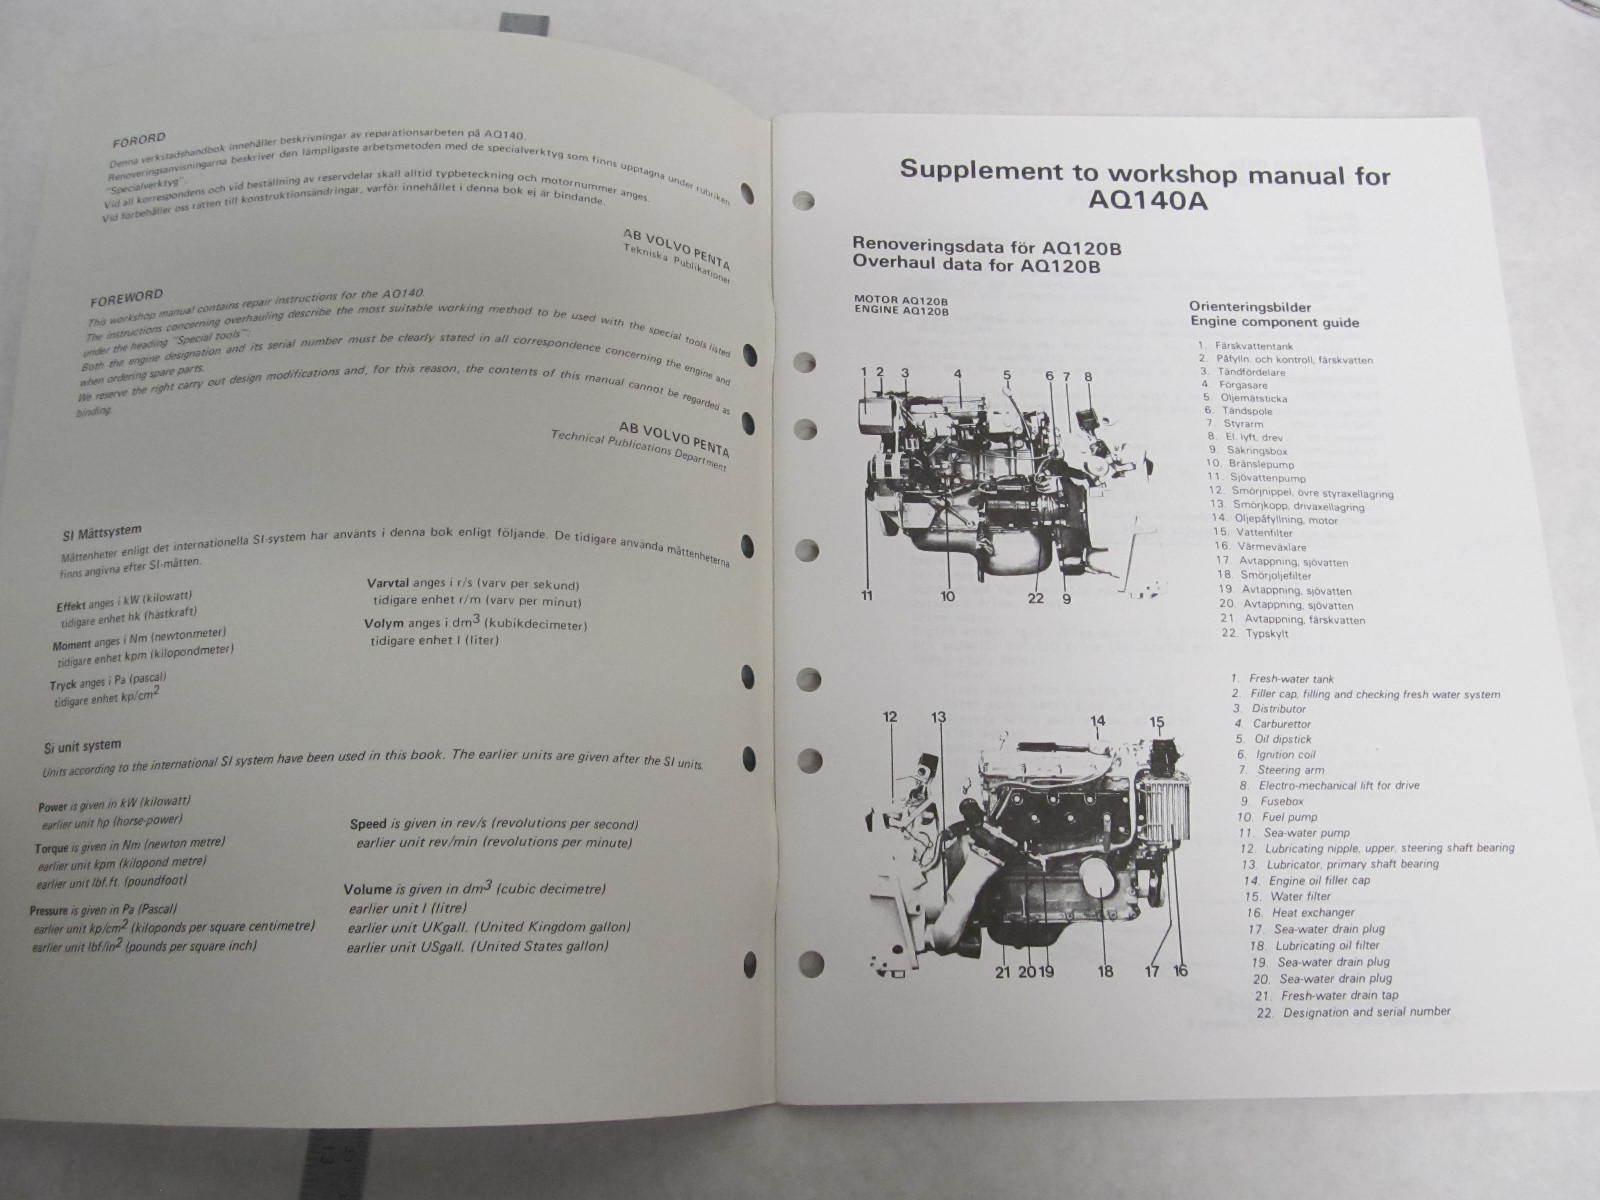 7732670 0 1976 volvo penta aquamatic service workshop Volvo Penta Engine Schematics Volvo Penta Engine Schematics